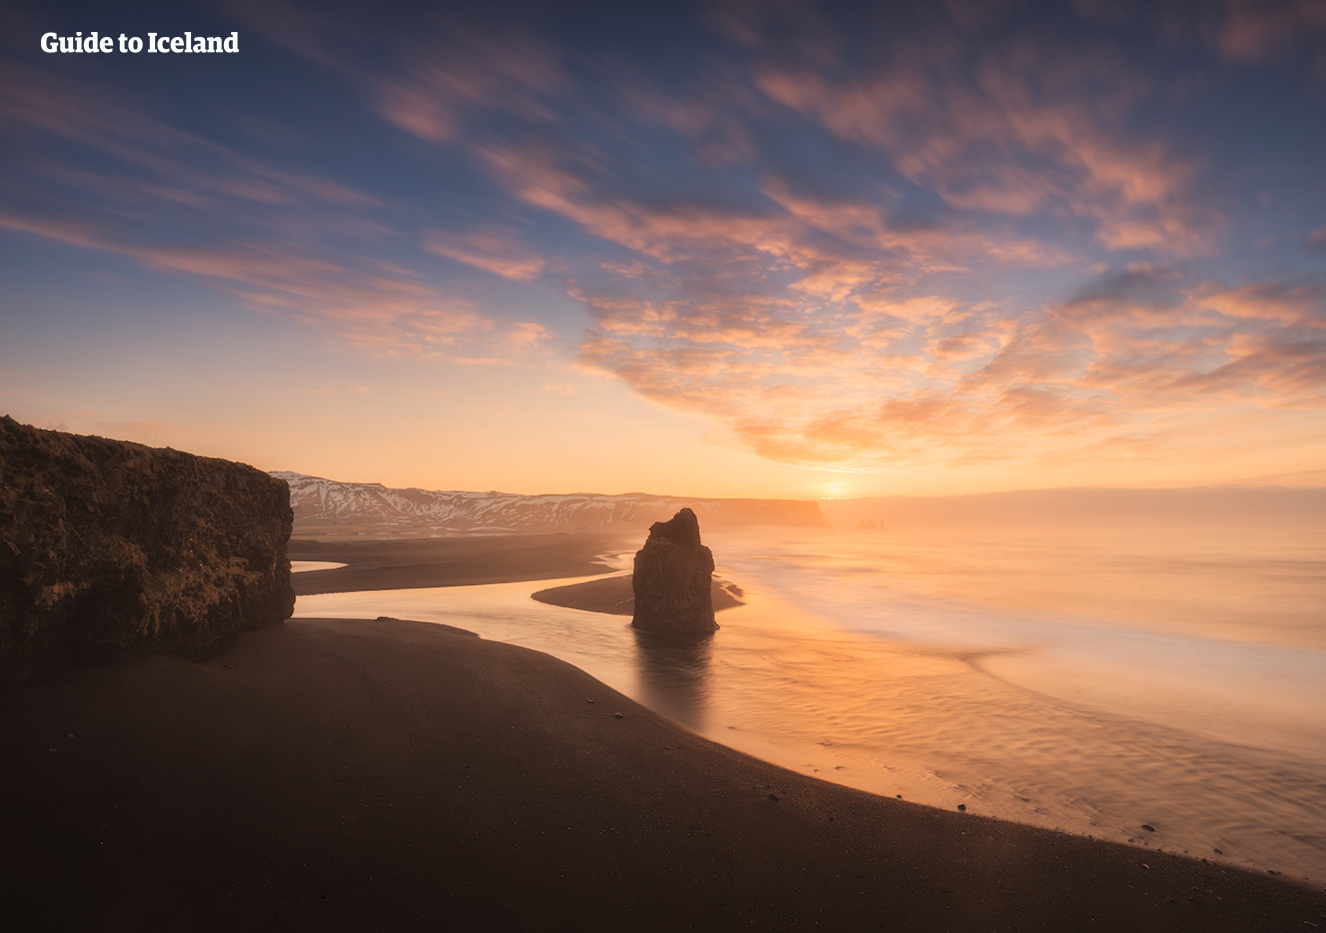 Scenic 5 Day Road Trip Adventure Through Iceland's South Coast, Landmannalaugar & Highlands - day 2